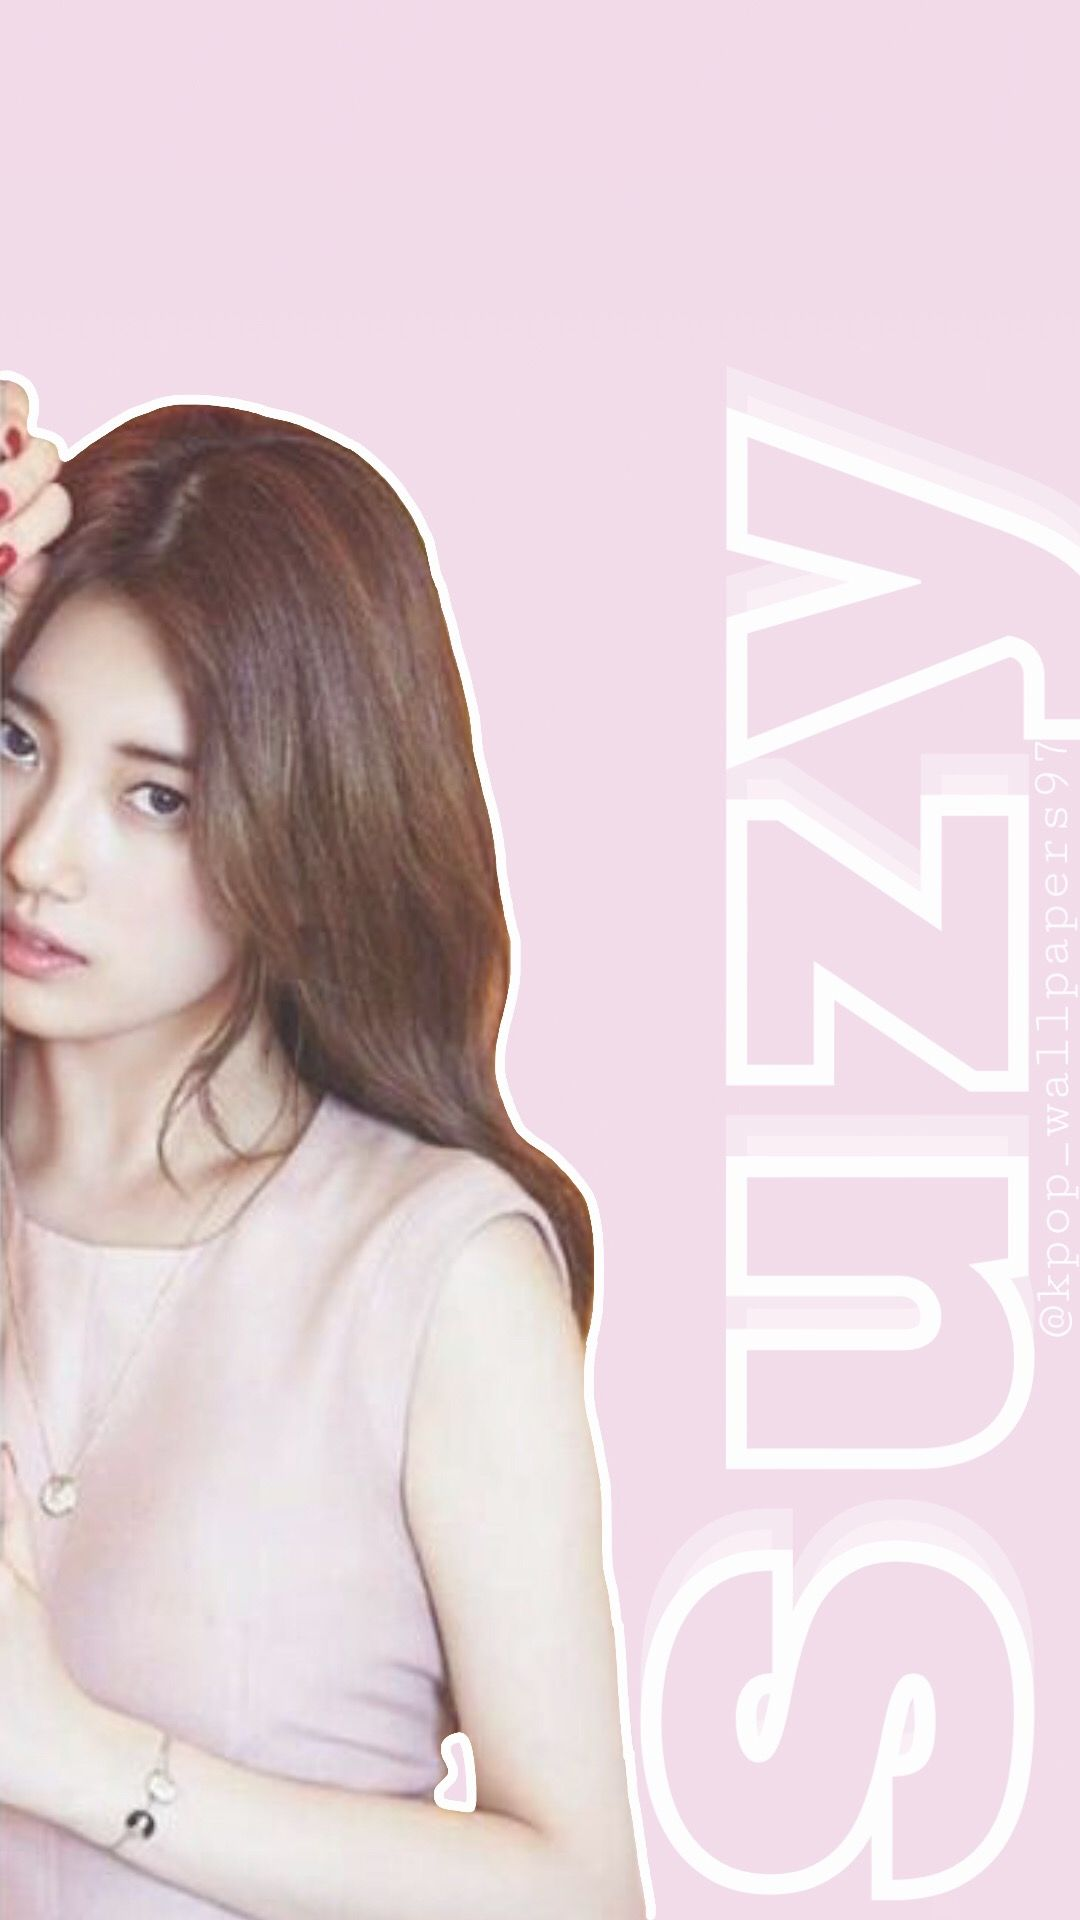 Suzy suzy baesuzy pink suzywallpaper suzyedit jyp kpop 1080x1920